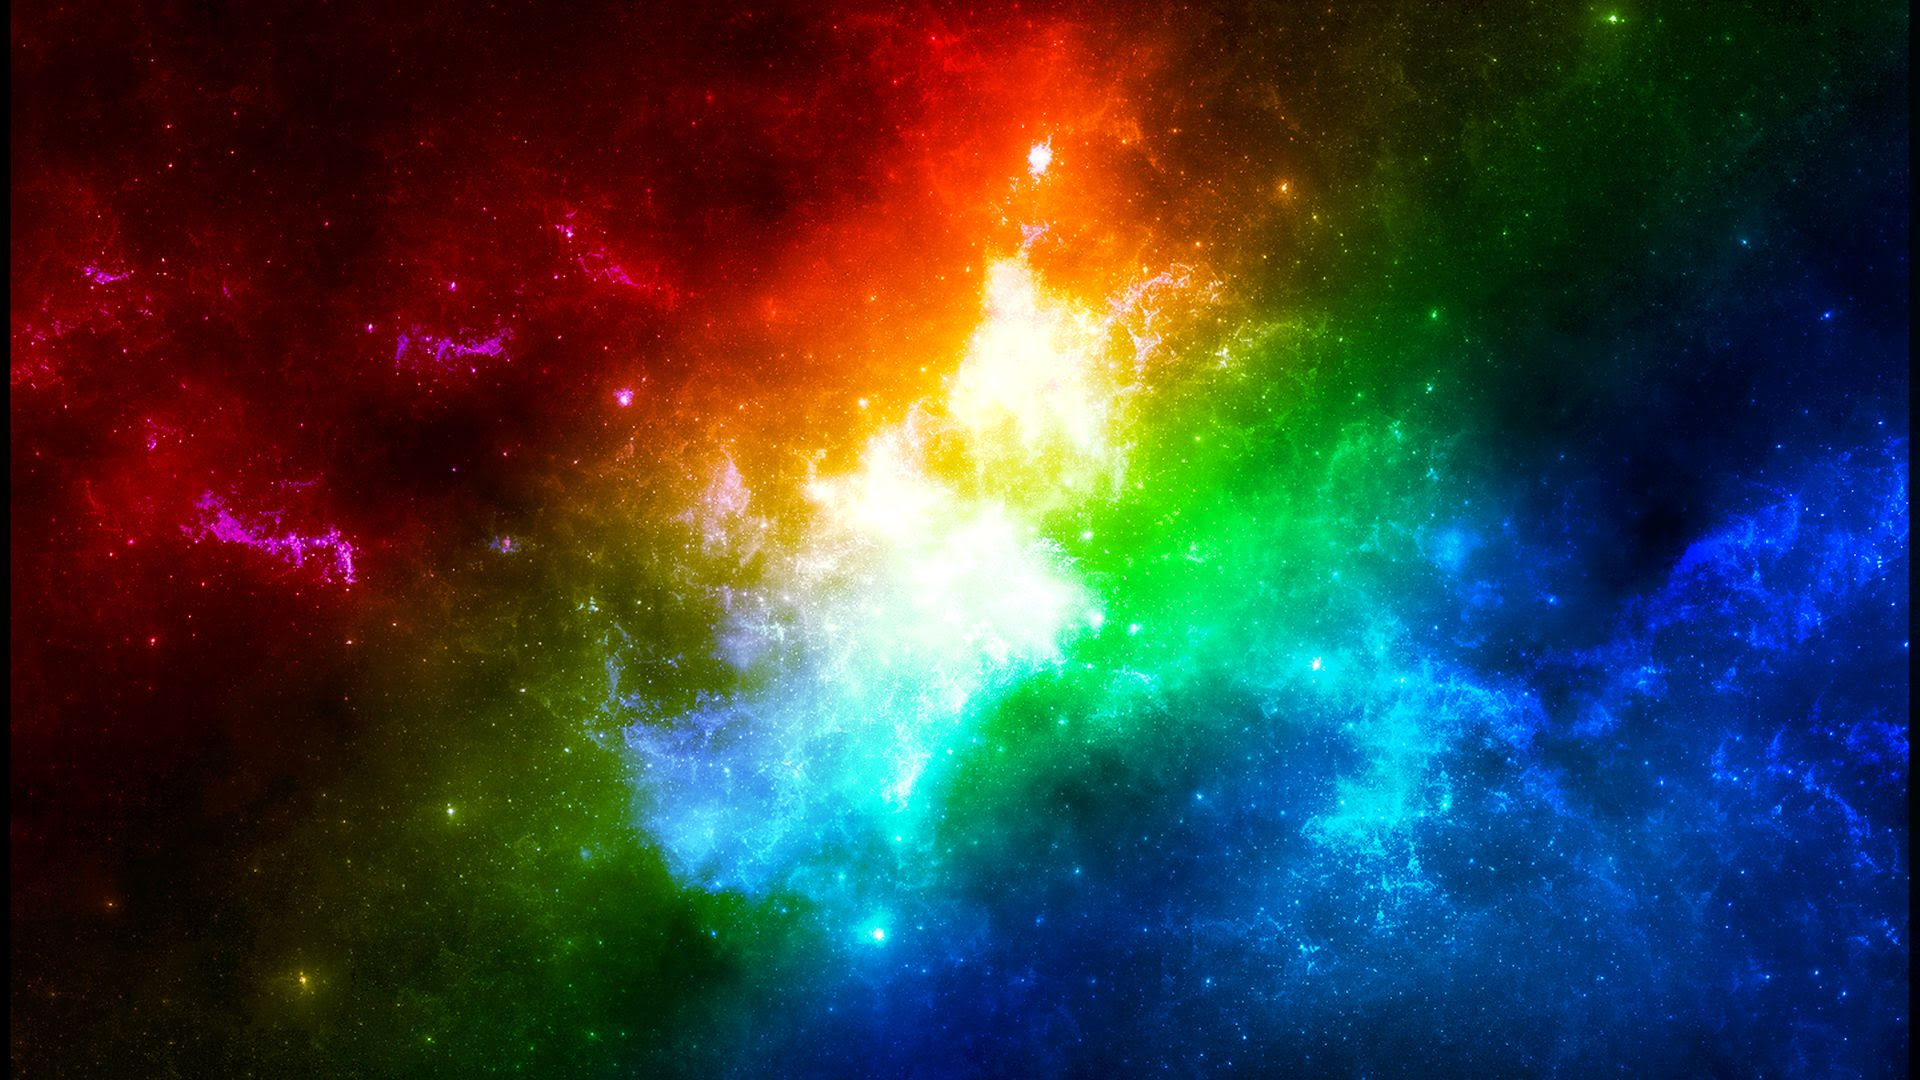 Unduh 61+ Gambar Galaxy Pelangi Paling Baru Gratis